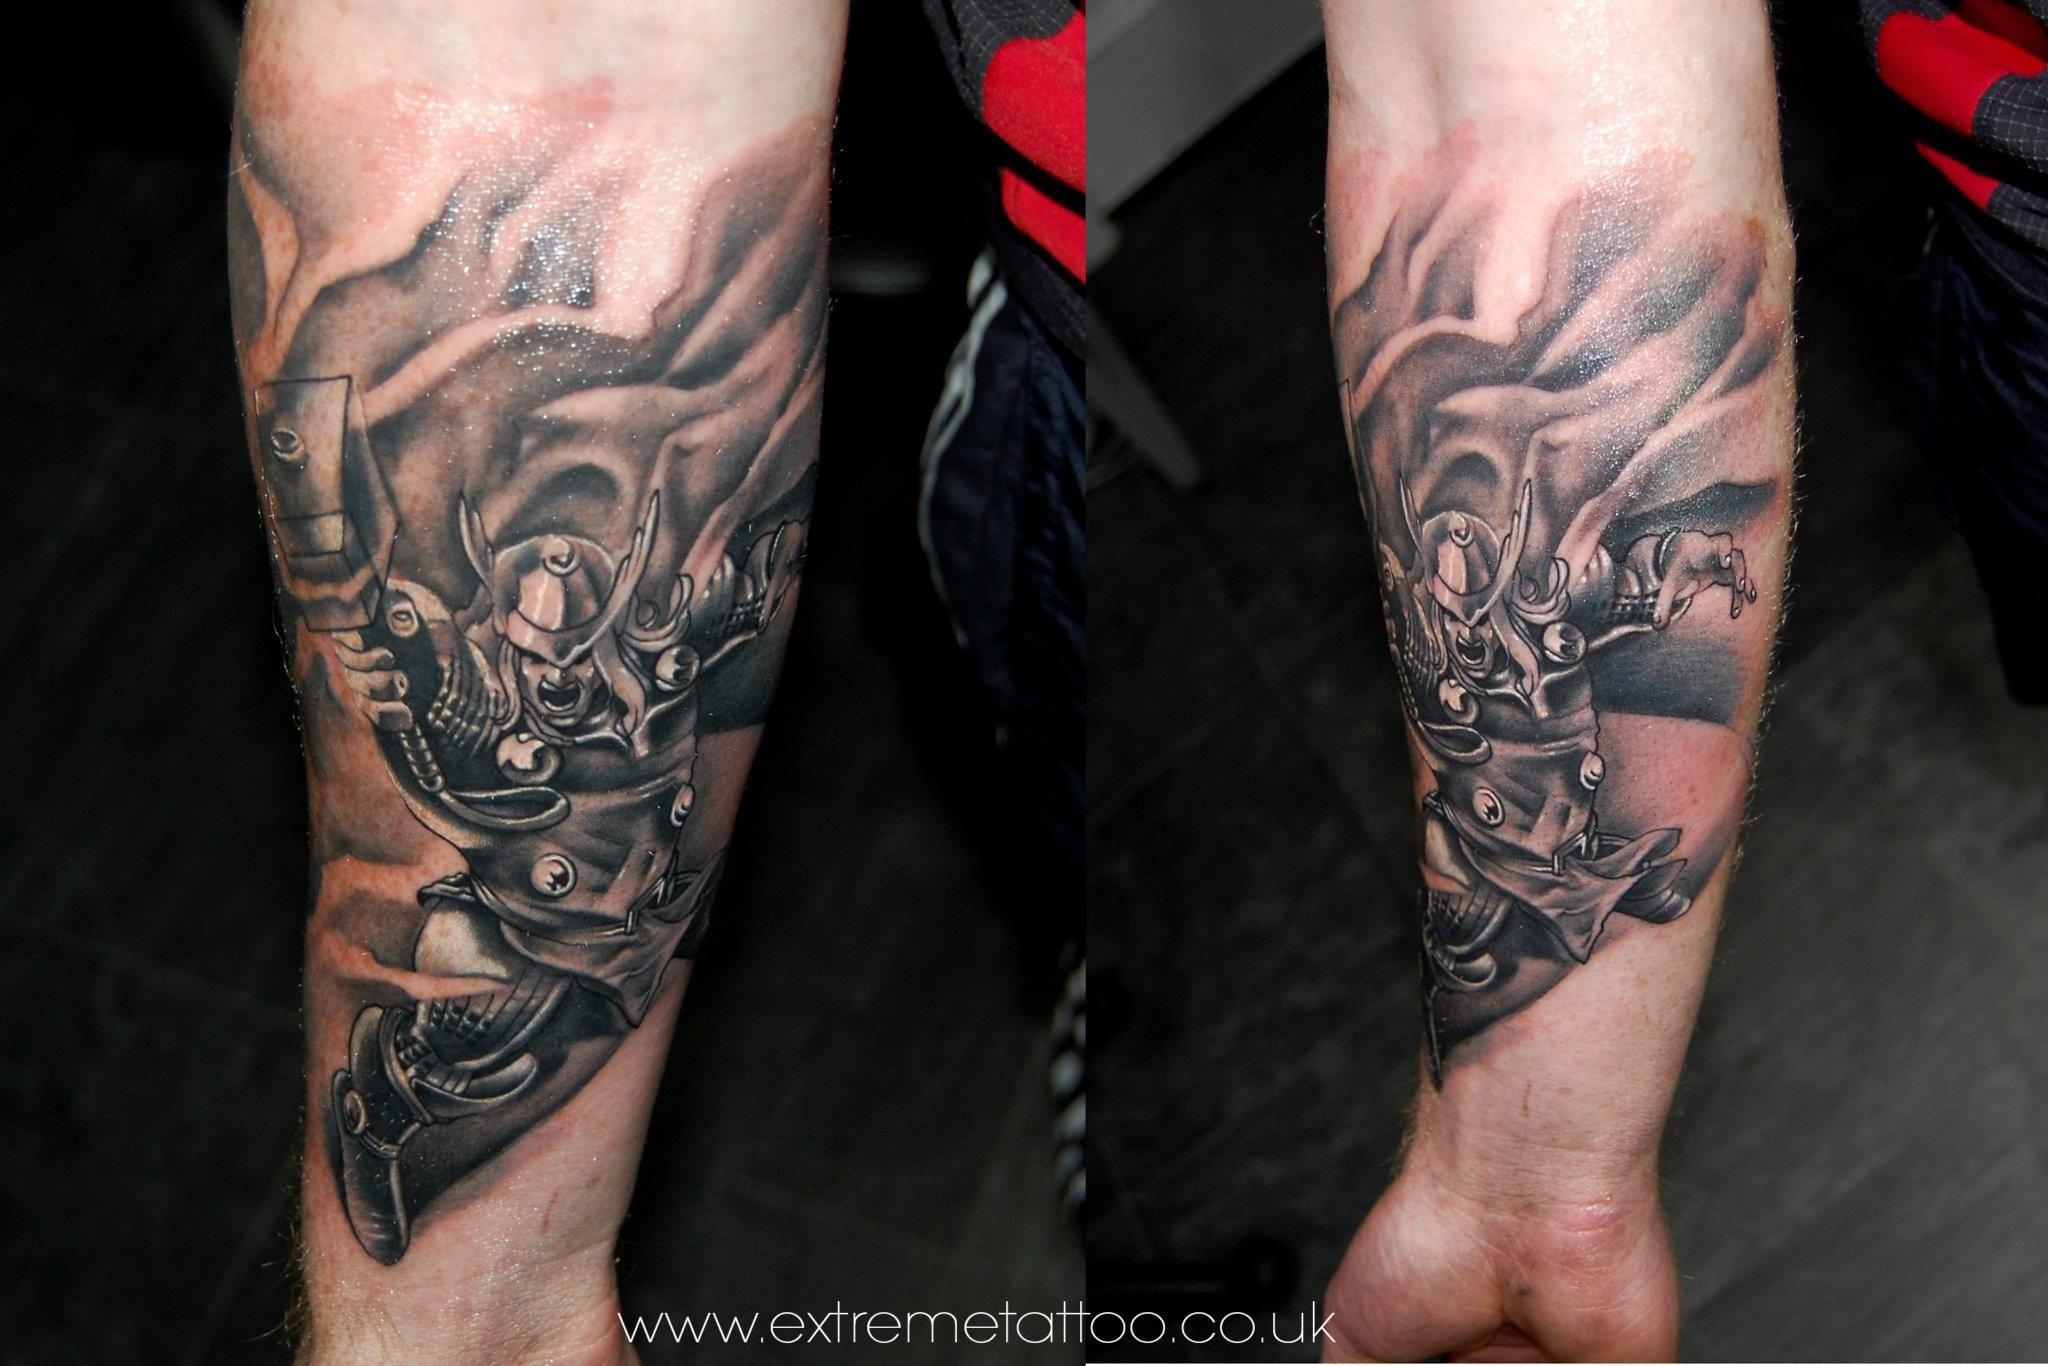 Line Art Tattoos : Thor tattoo gabi tomescu.extreme tattoo&piercing. fort william